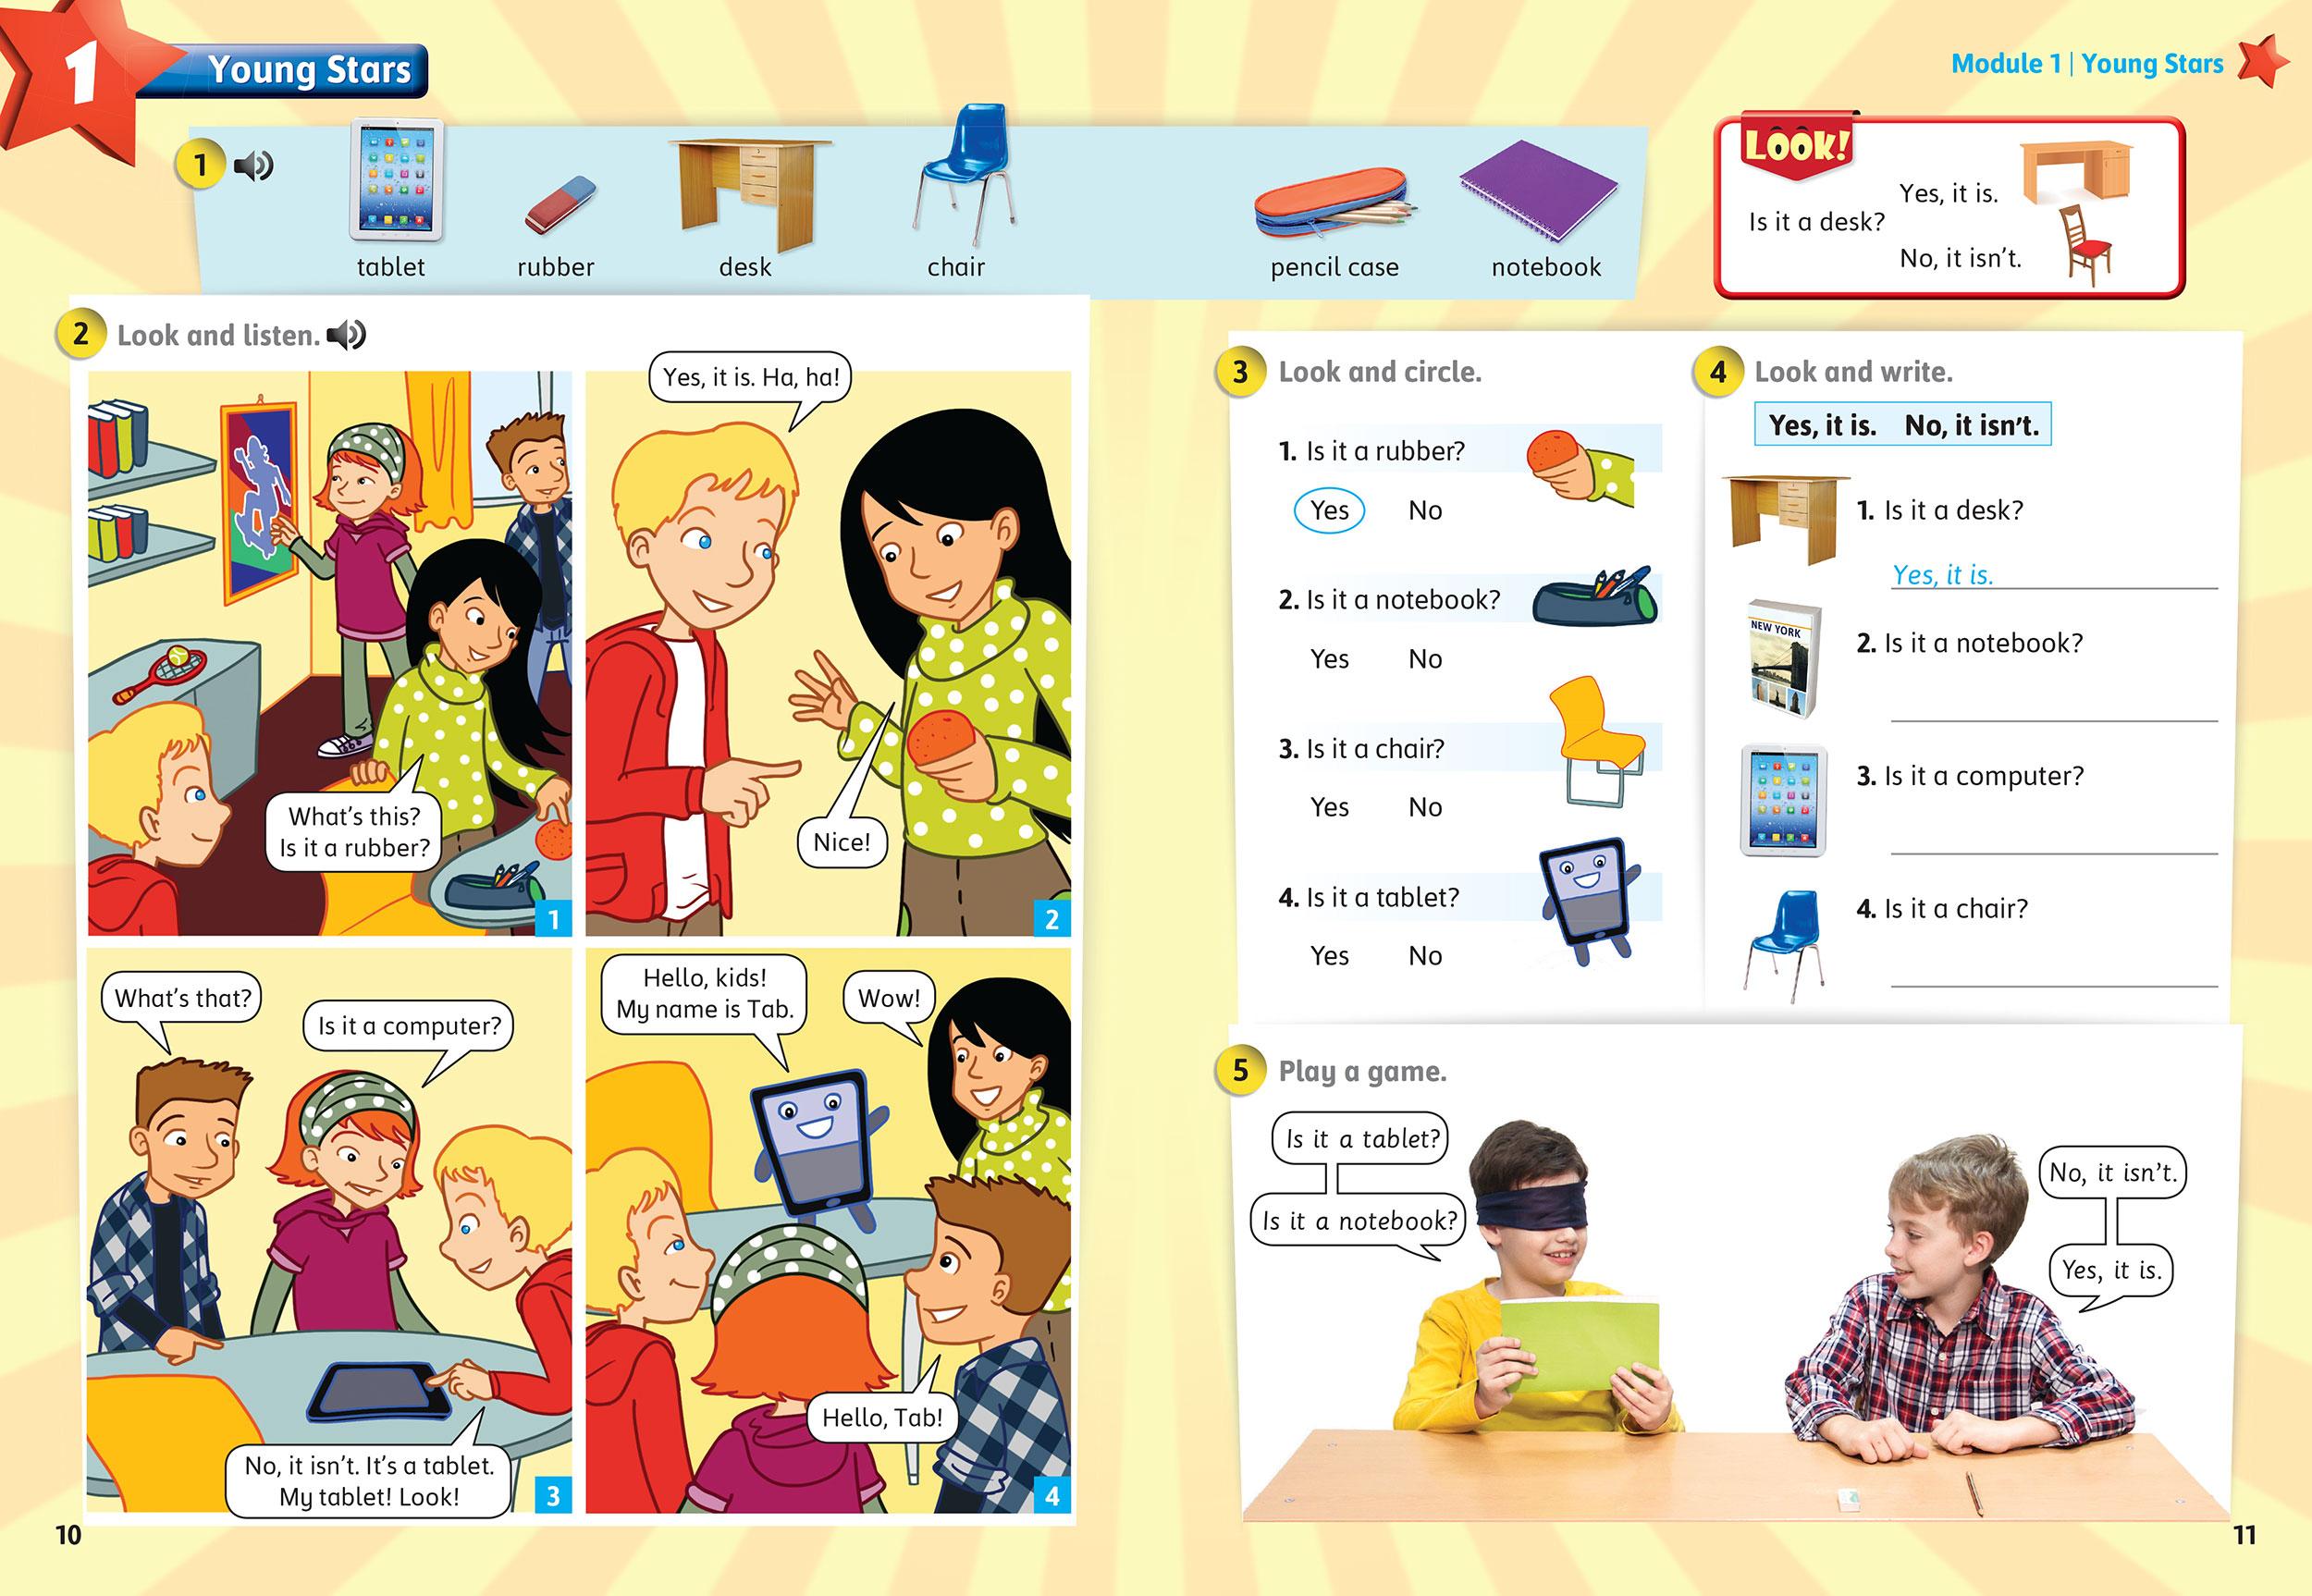 Toefl english grammar book pdf – Support